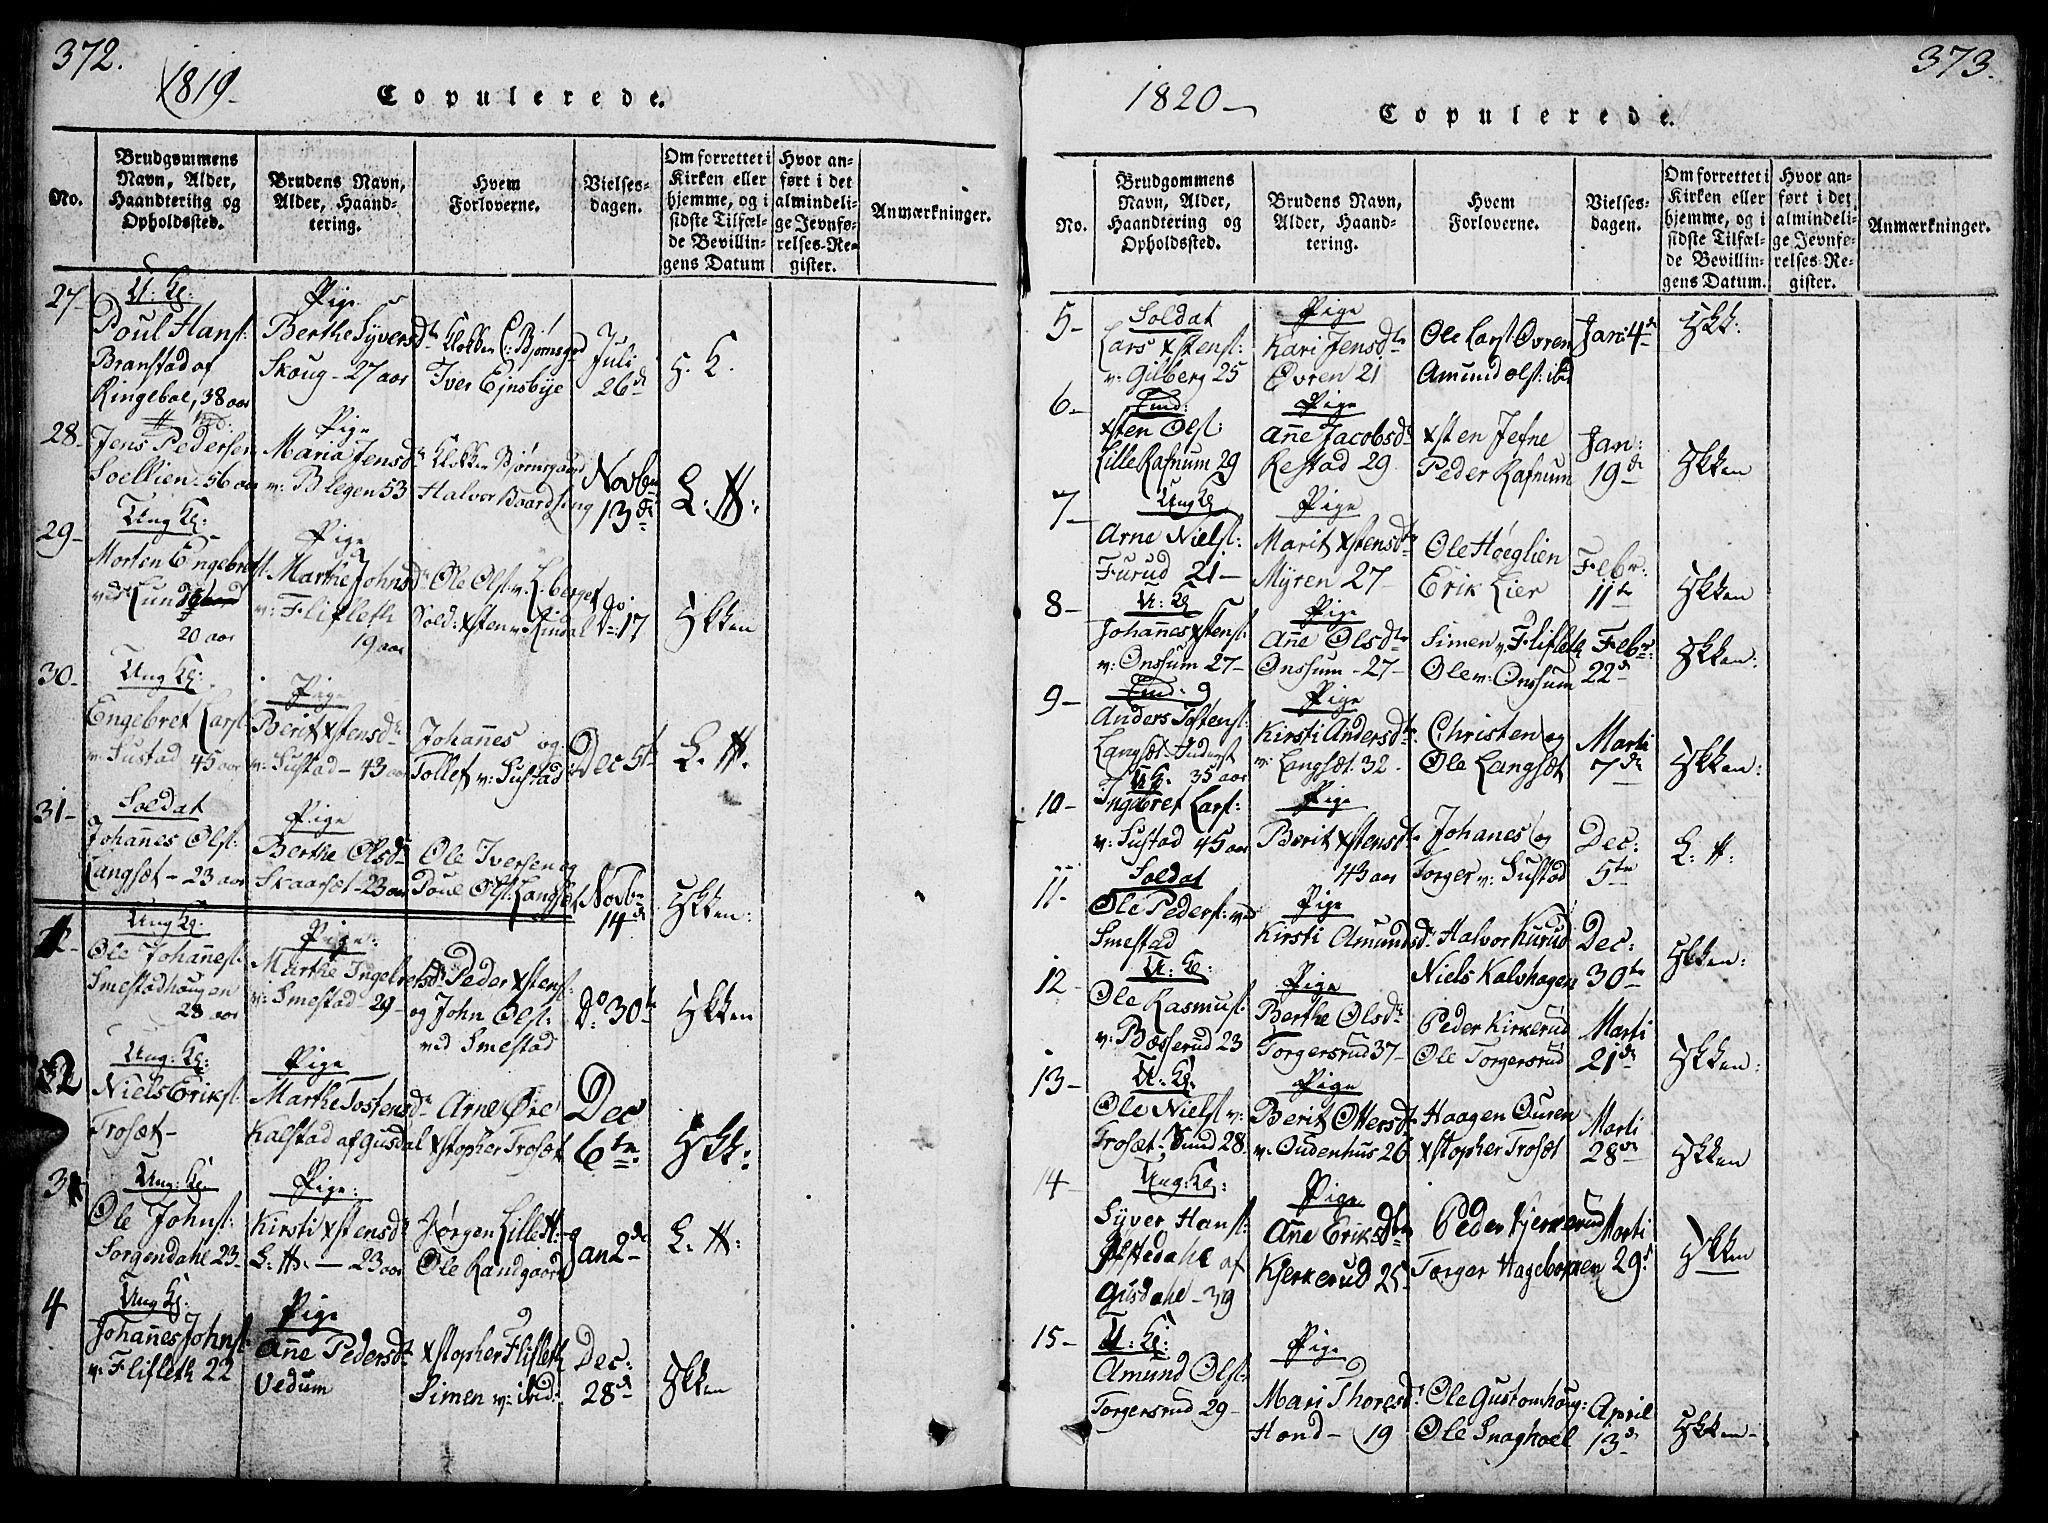 SAH, Fåberg prestekontor, Klokkerbok nr. 4, 1818-1837, s. 372-373